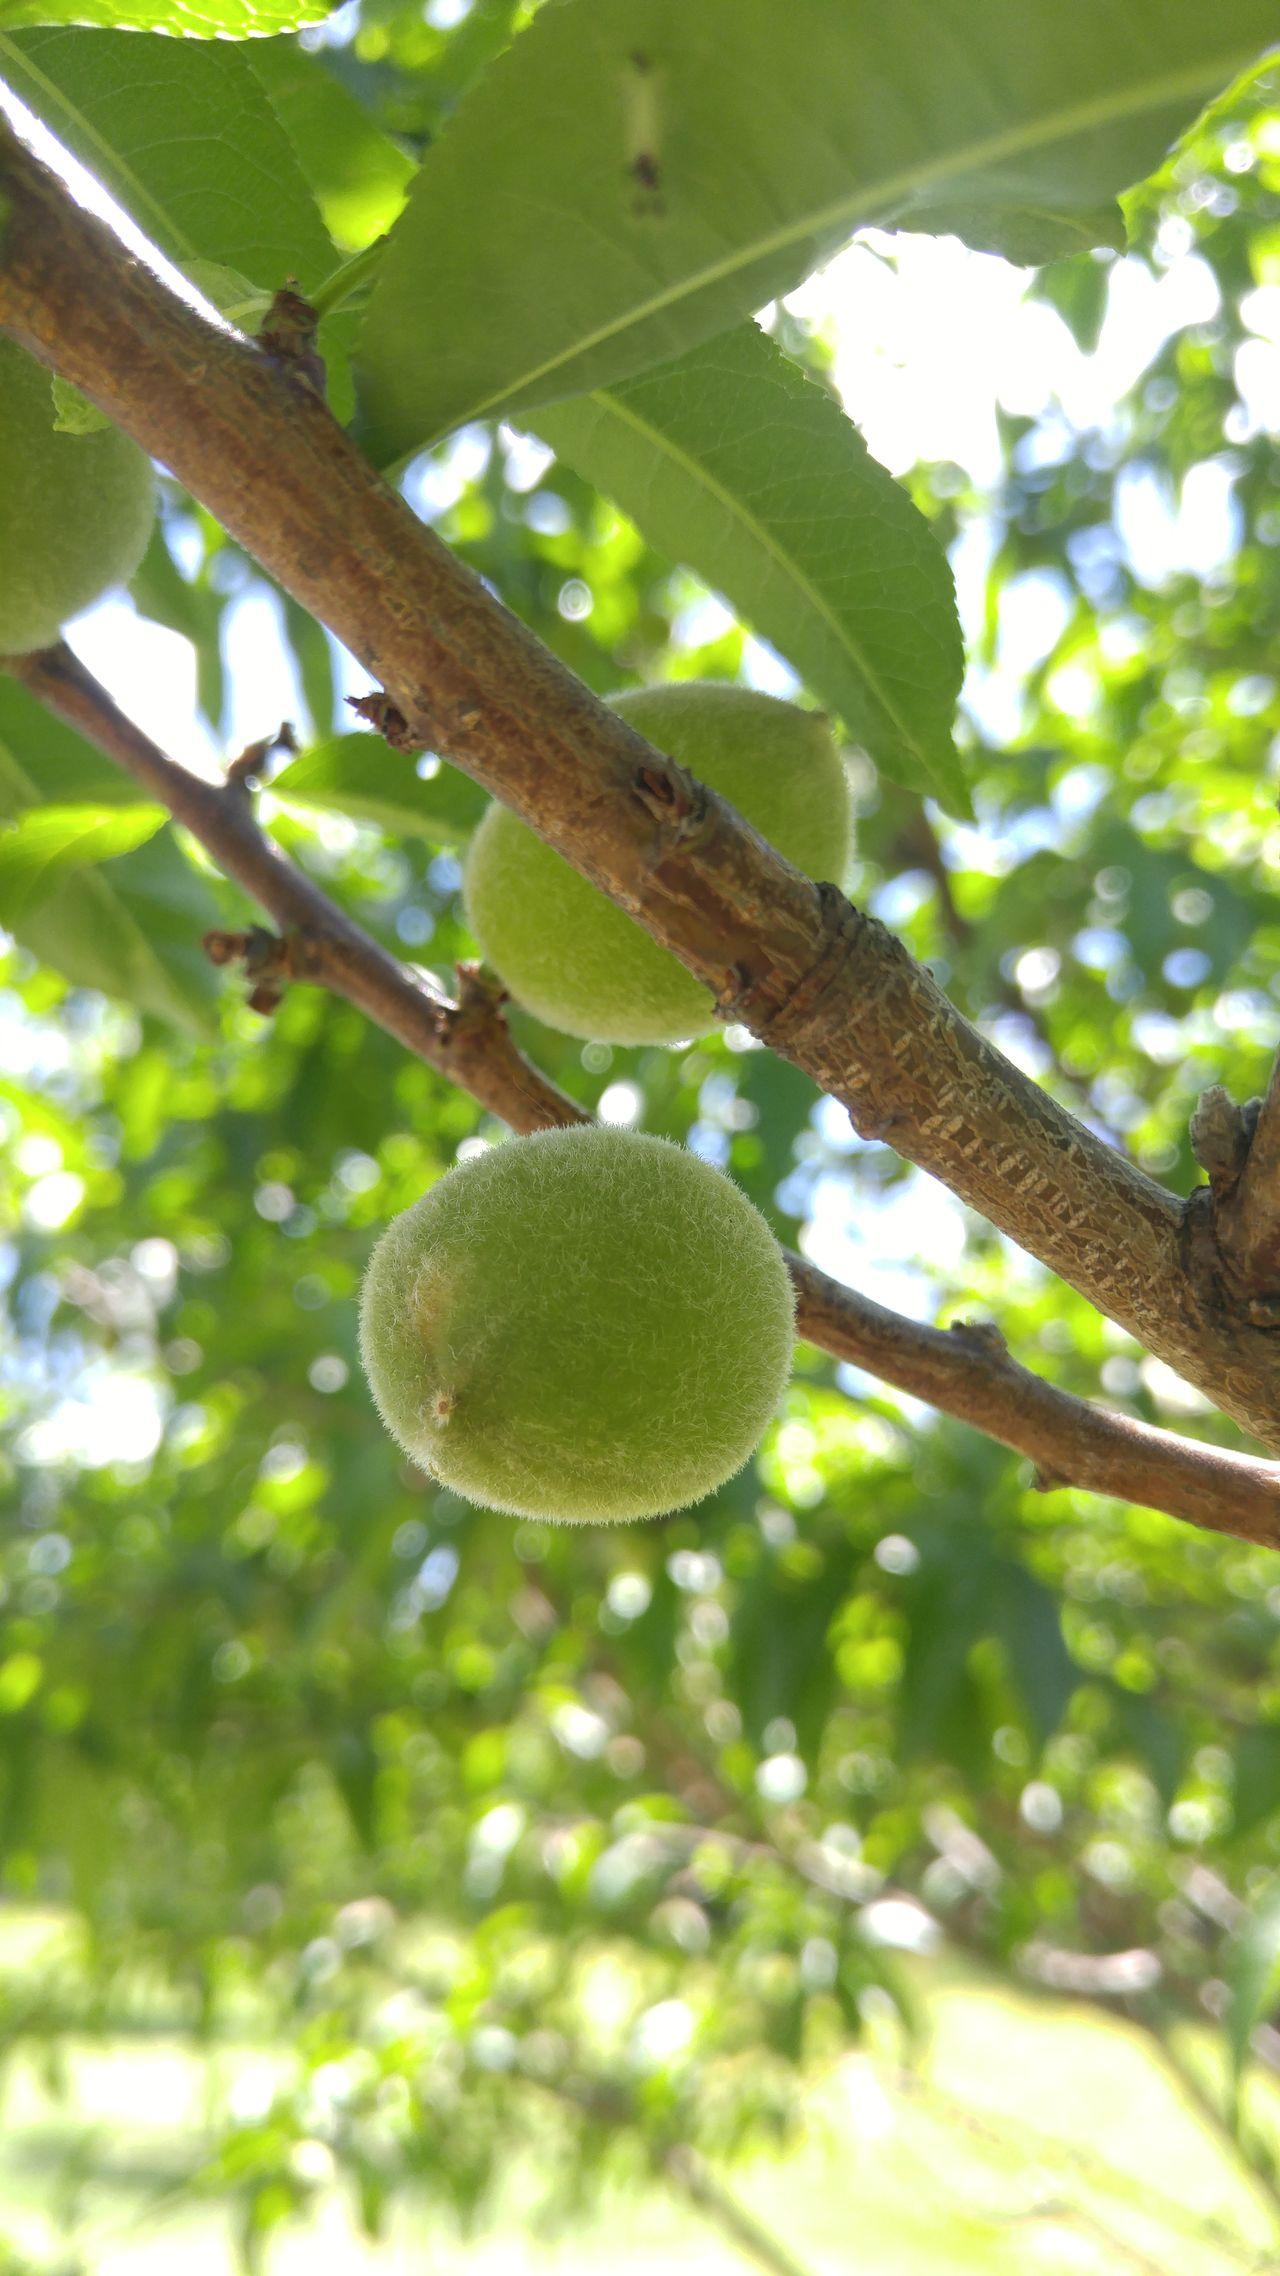 Peach New Life New Growth Nature Photography Outdoor Photography Fruitporn Fruit Garden Photography Fwjphotos Spring Springtime Green Brown Peachfuzz